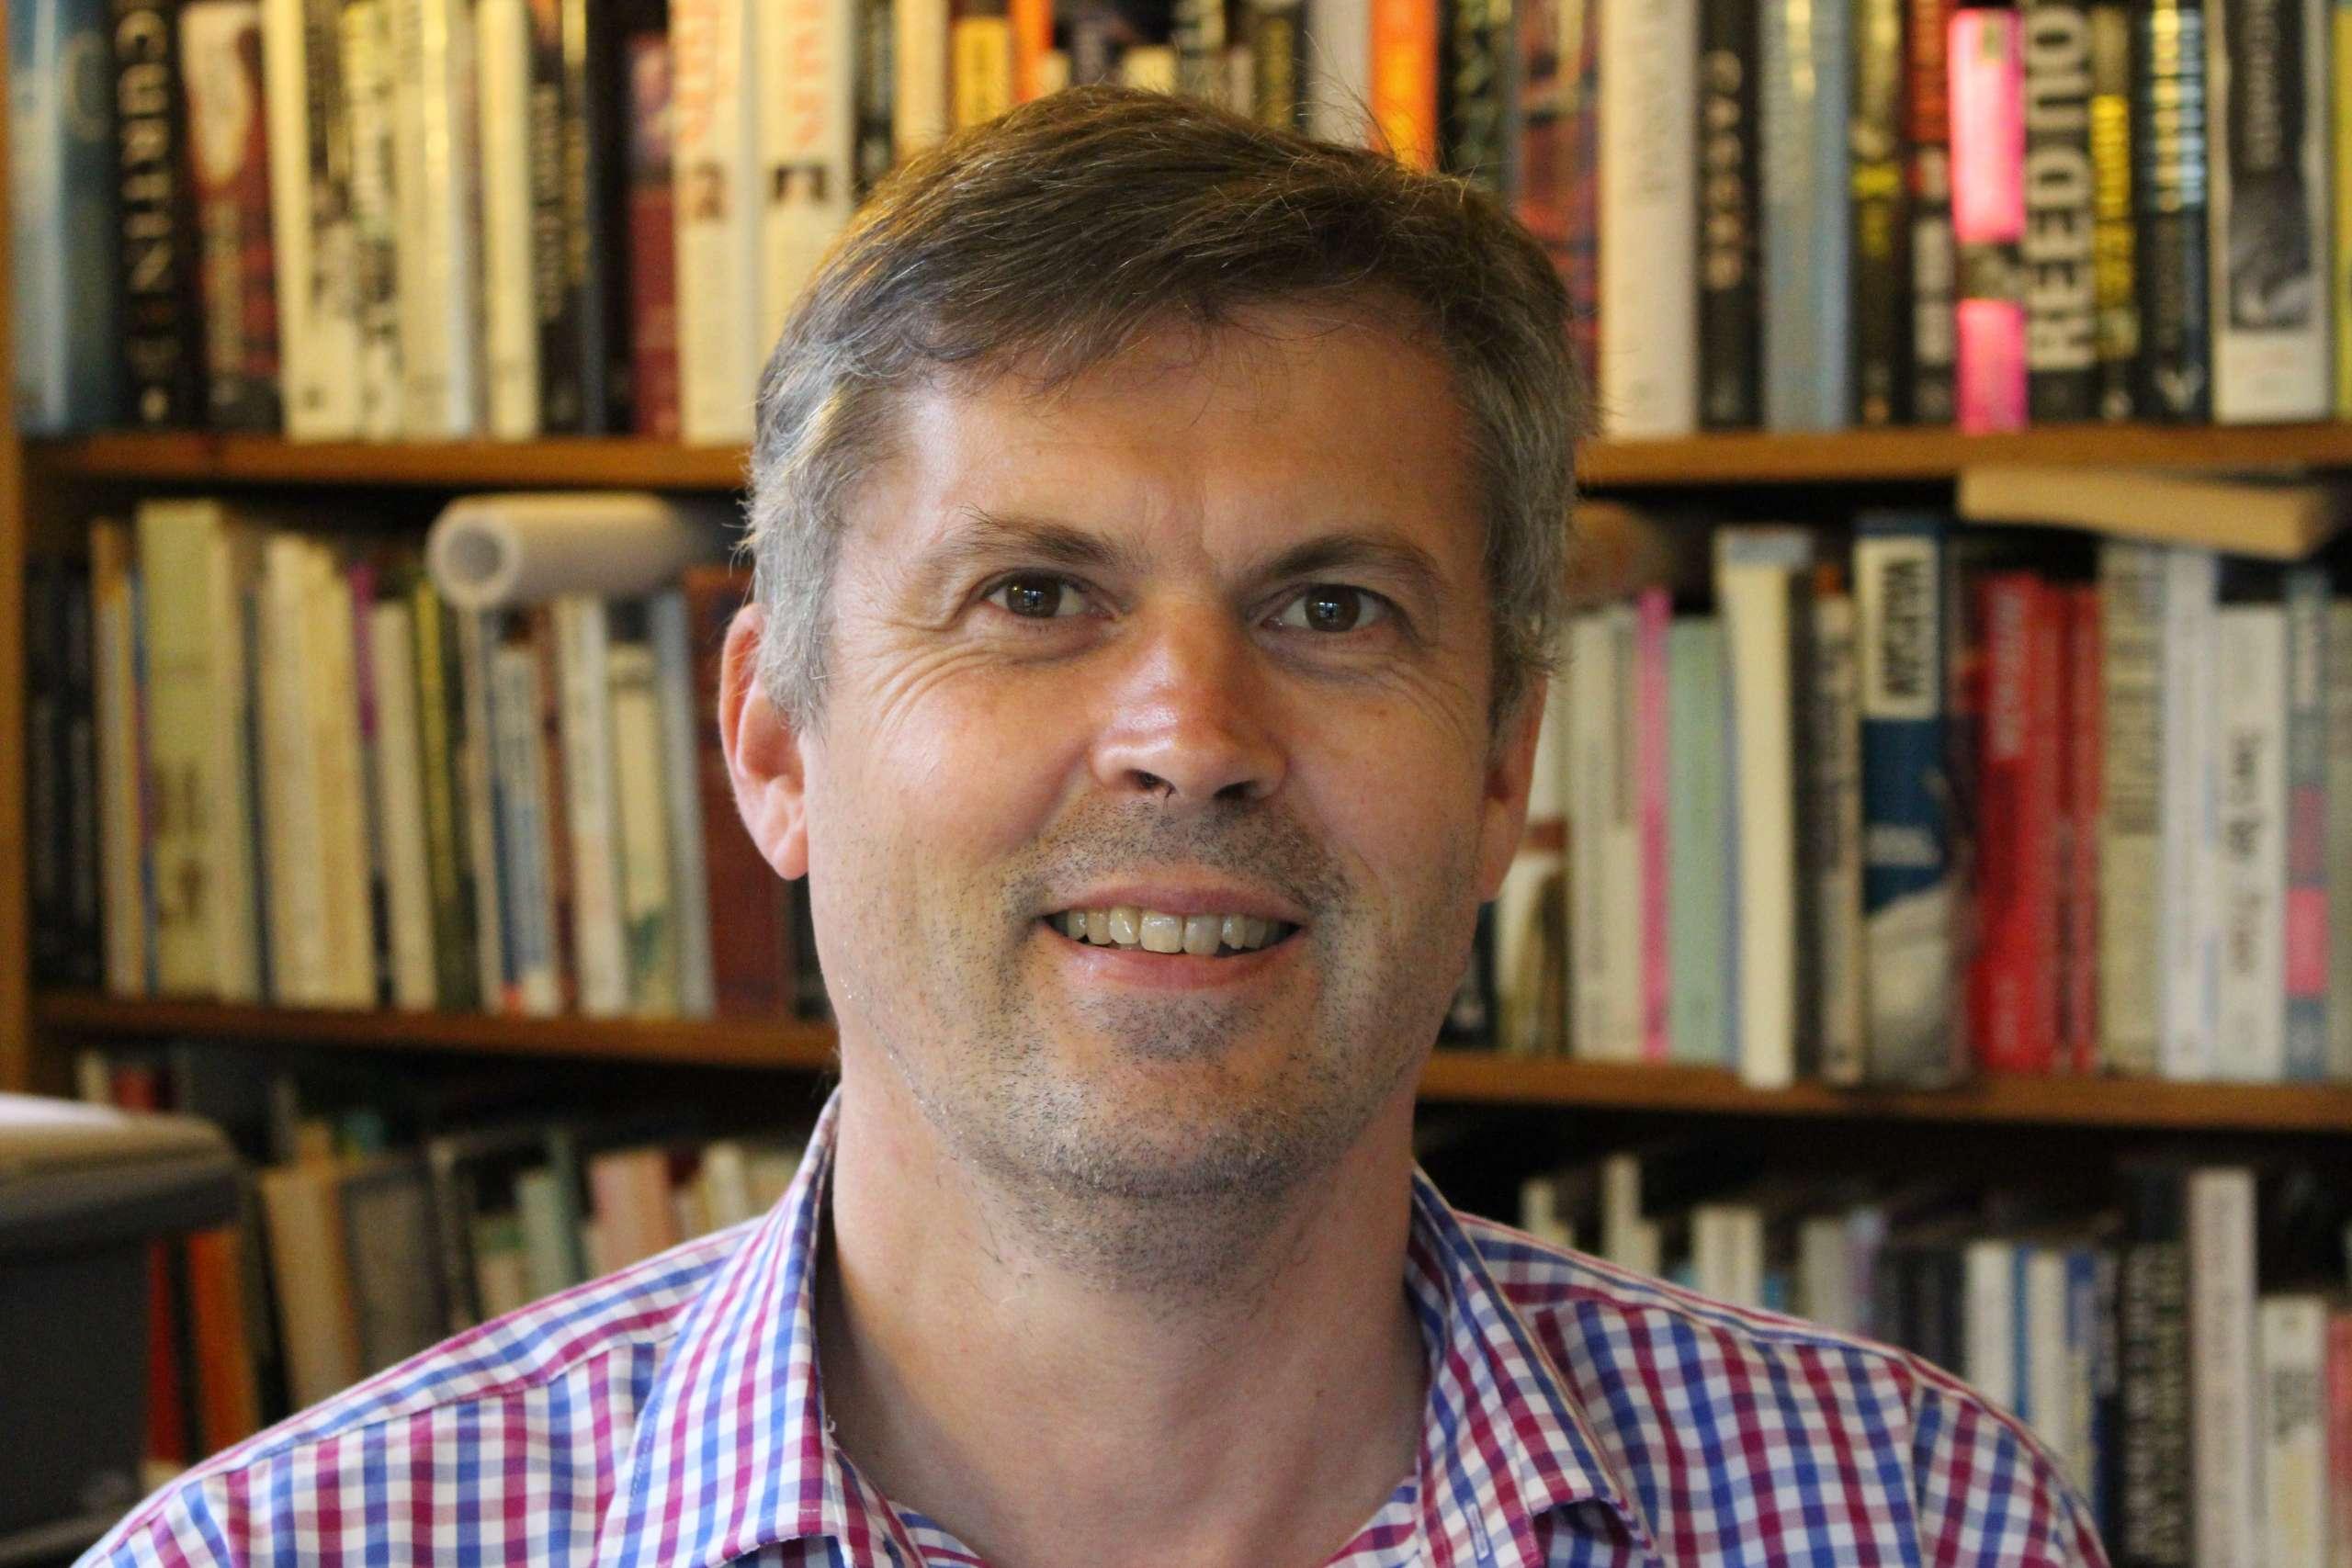 Kriteria Baru: saham perjudian yang akan disodorkan pasca-krisis coronavirus - Tim Boreham